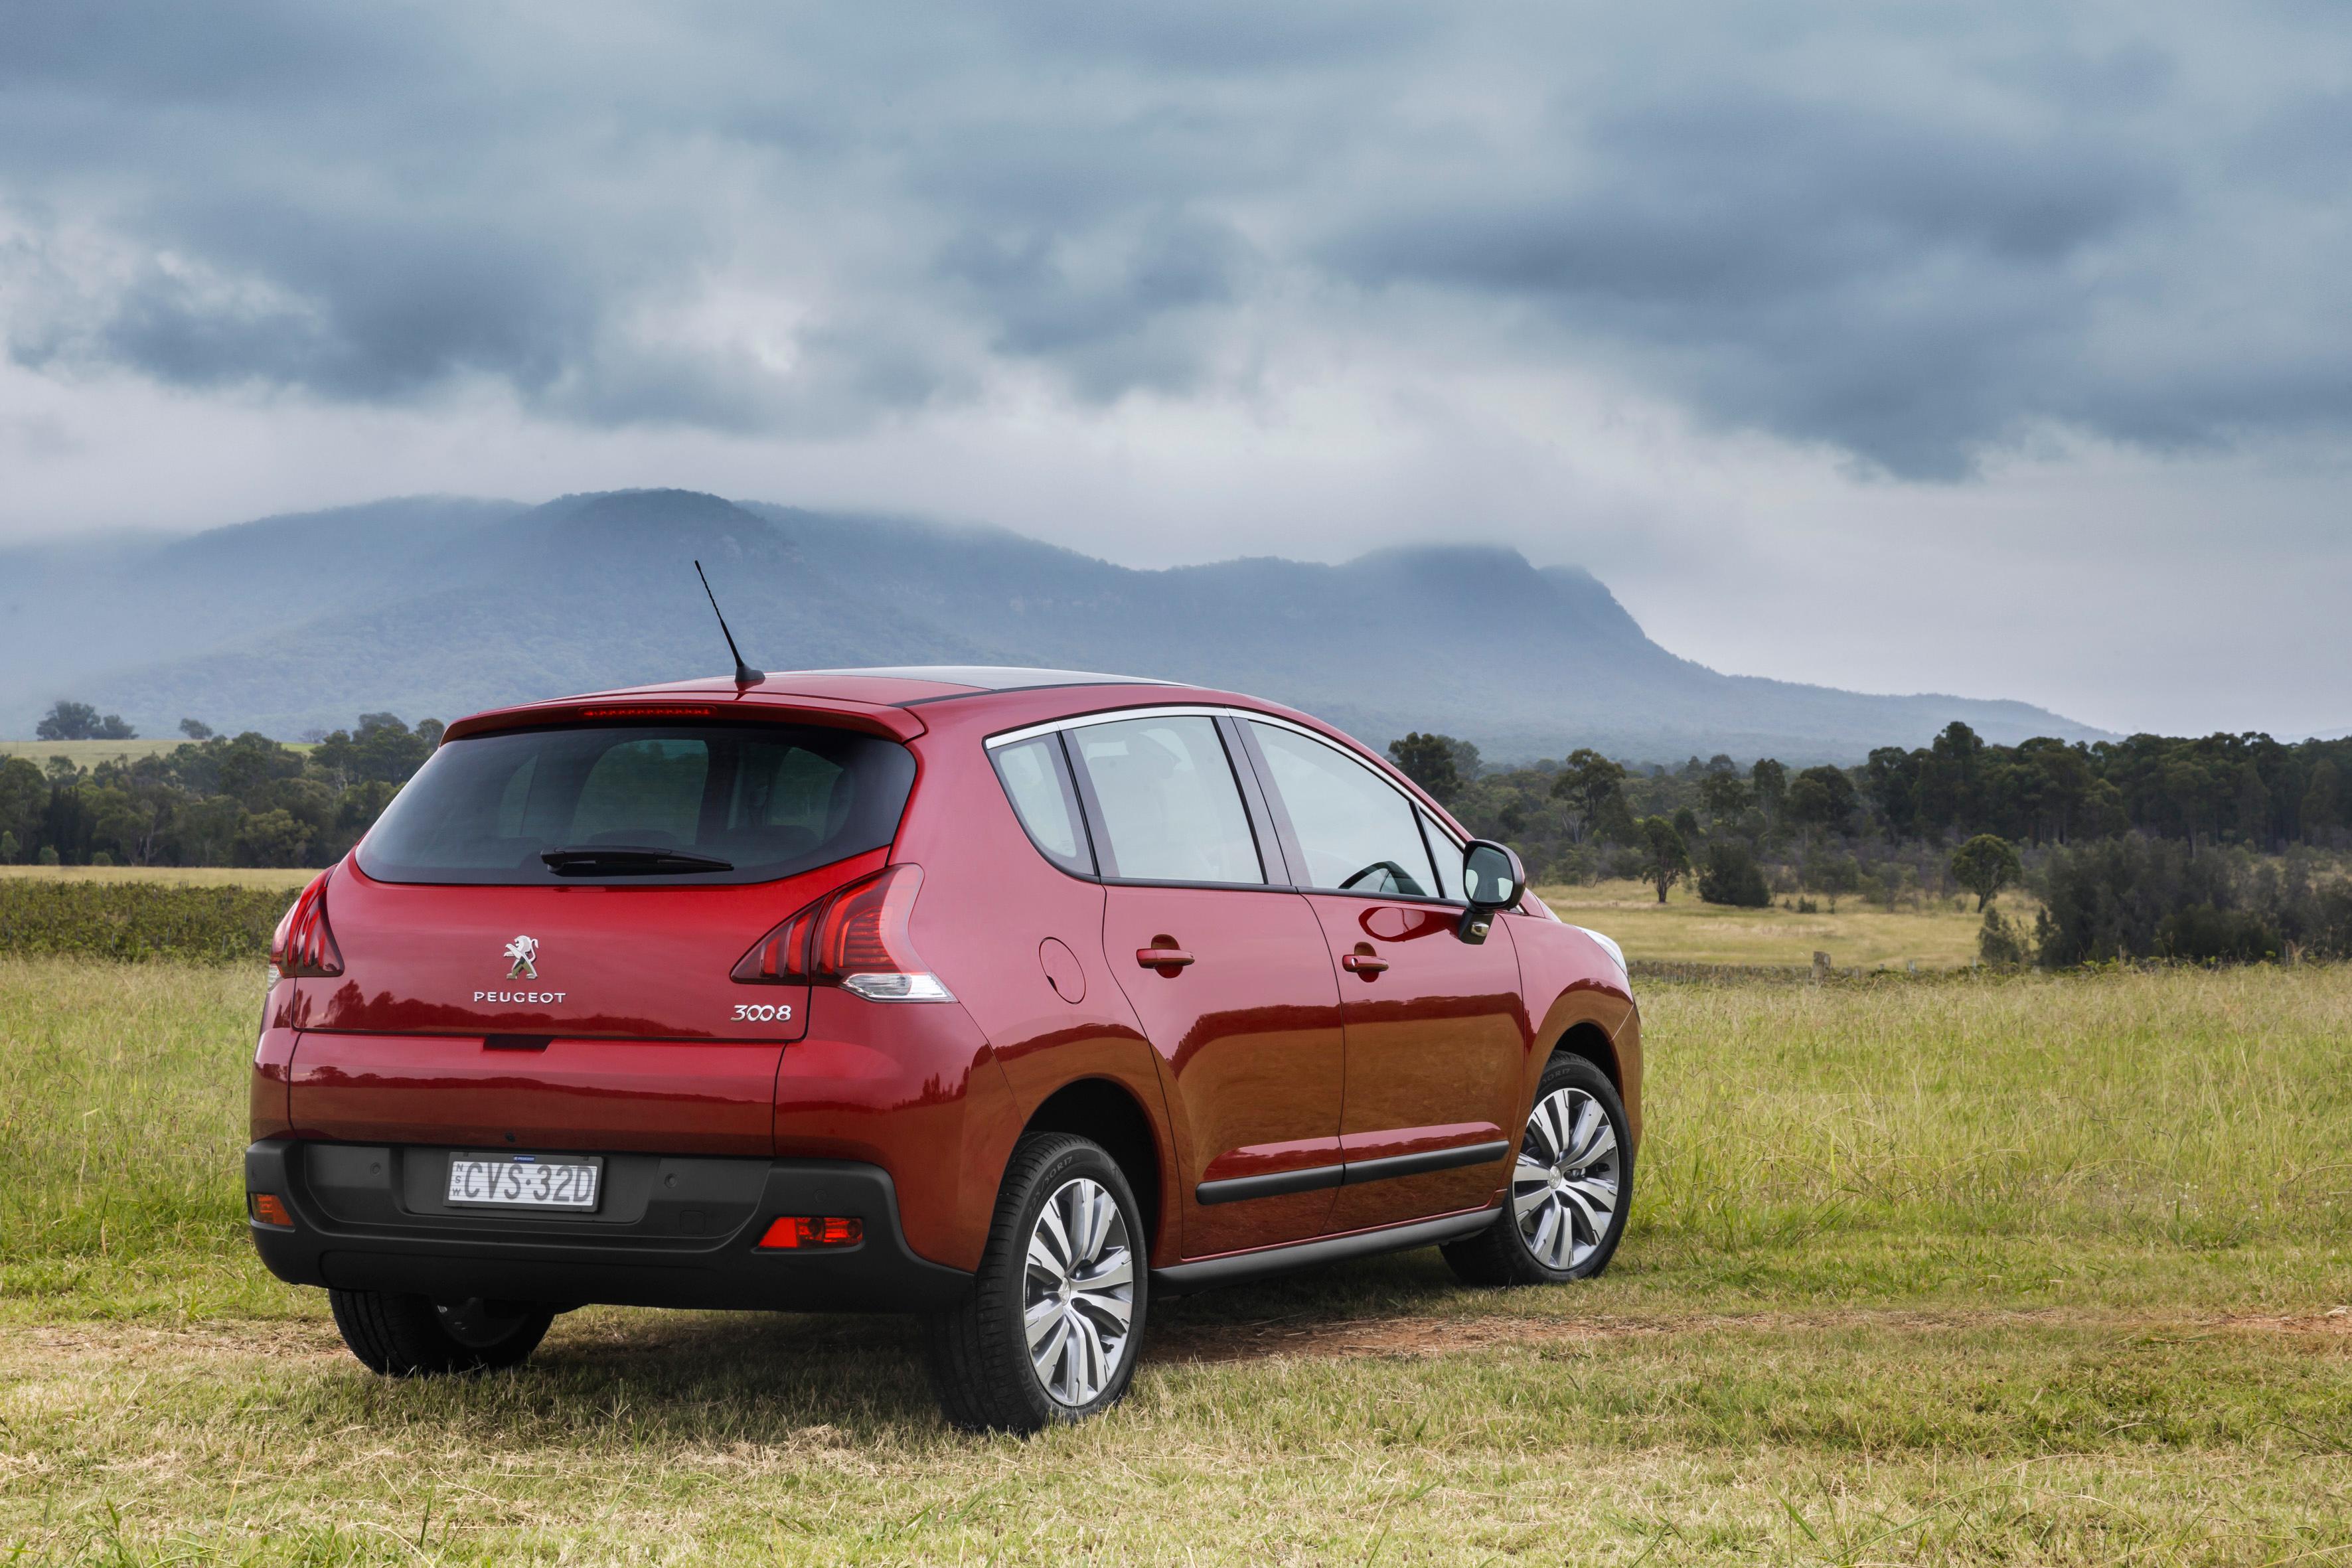 2015 Peugeot 3008 Review